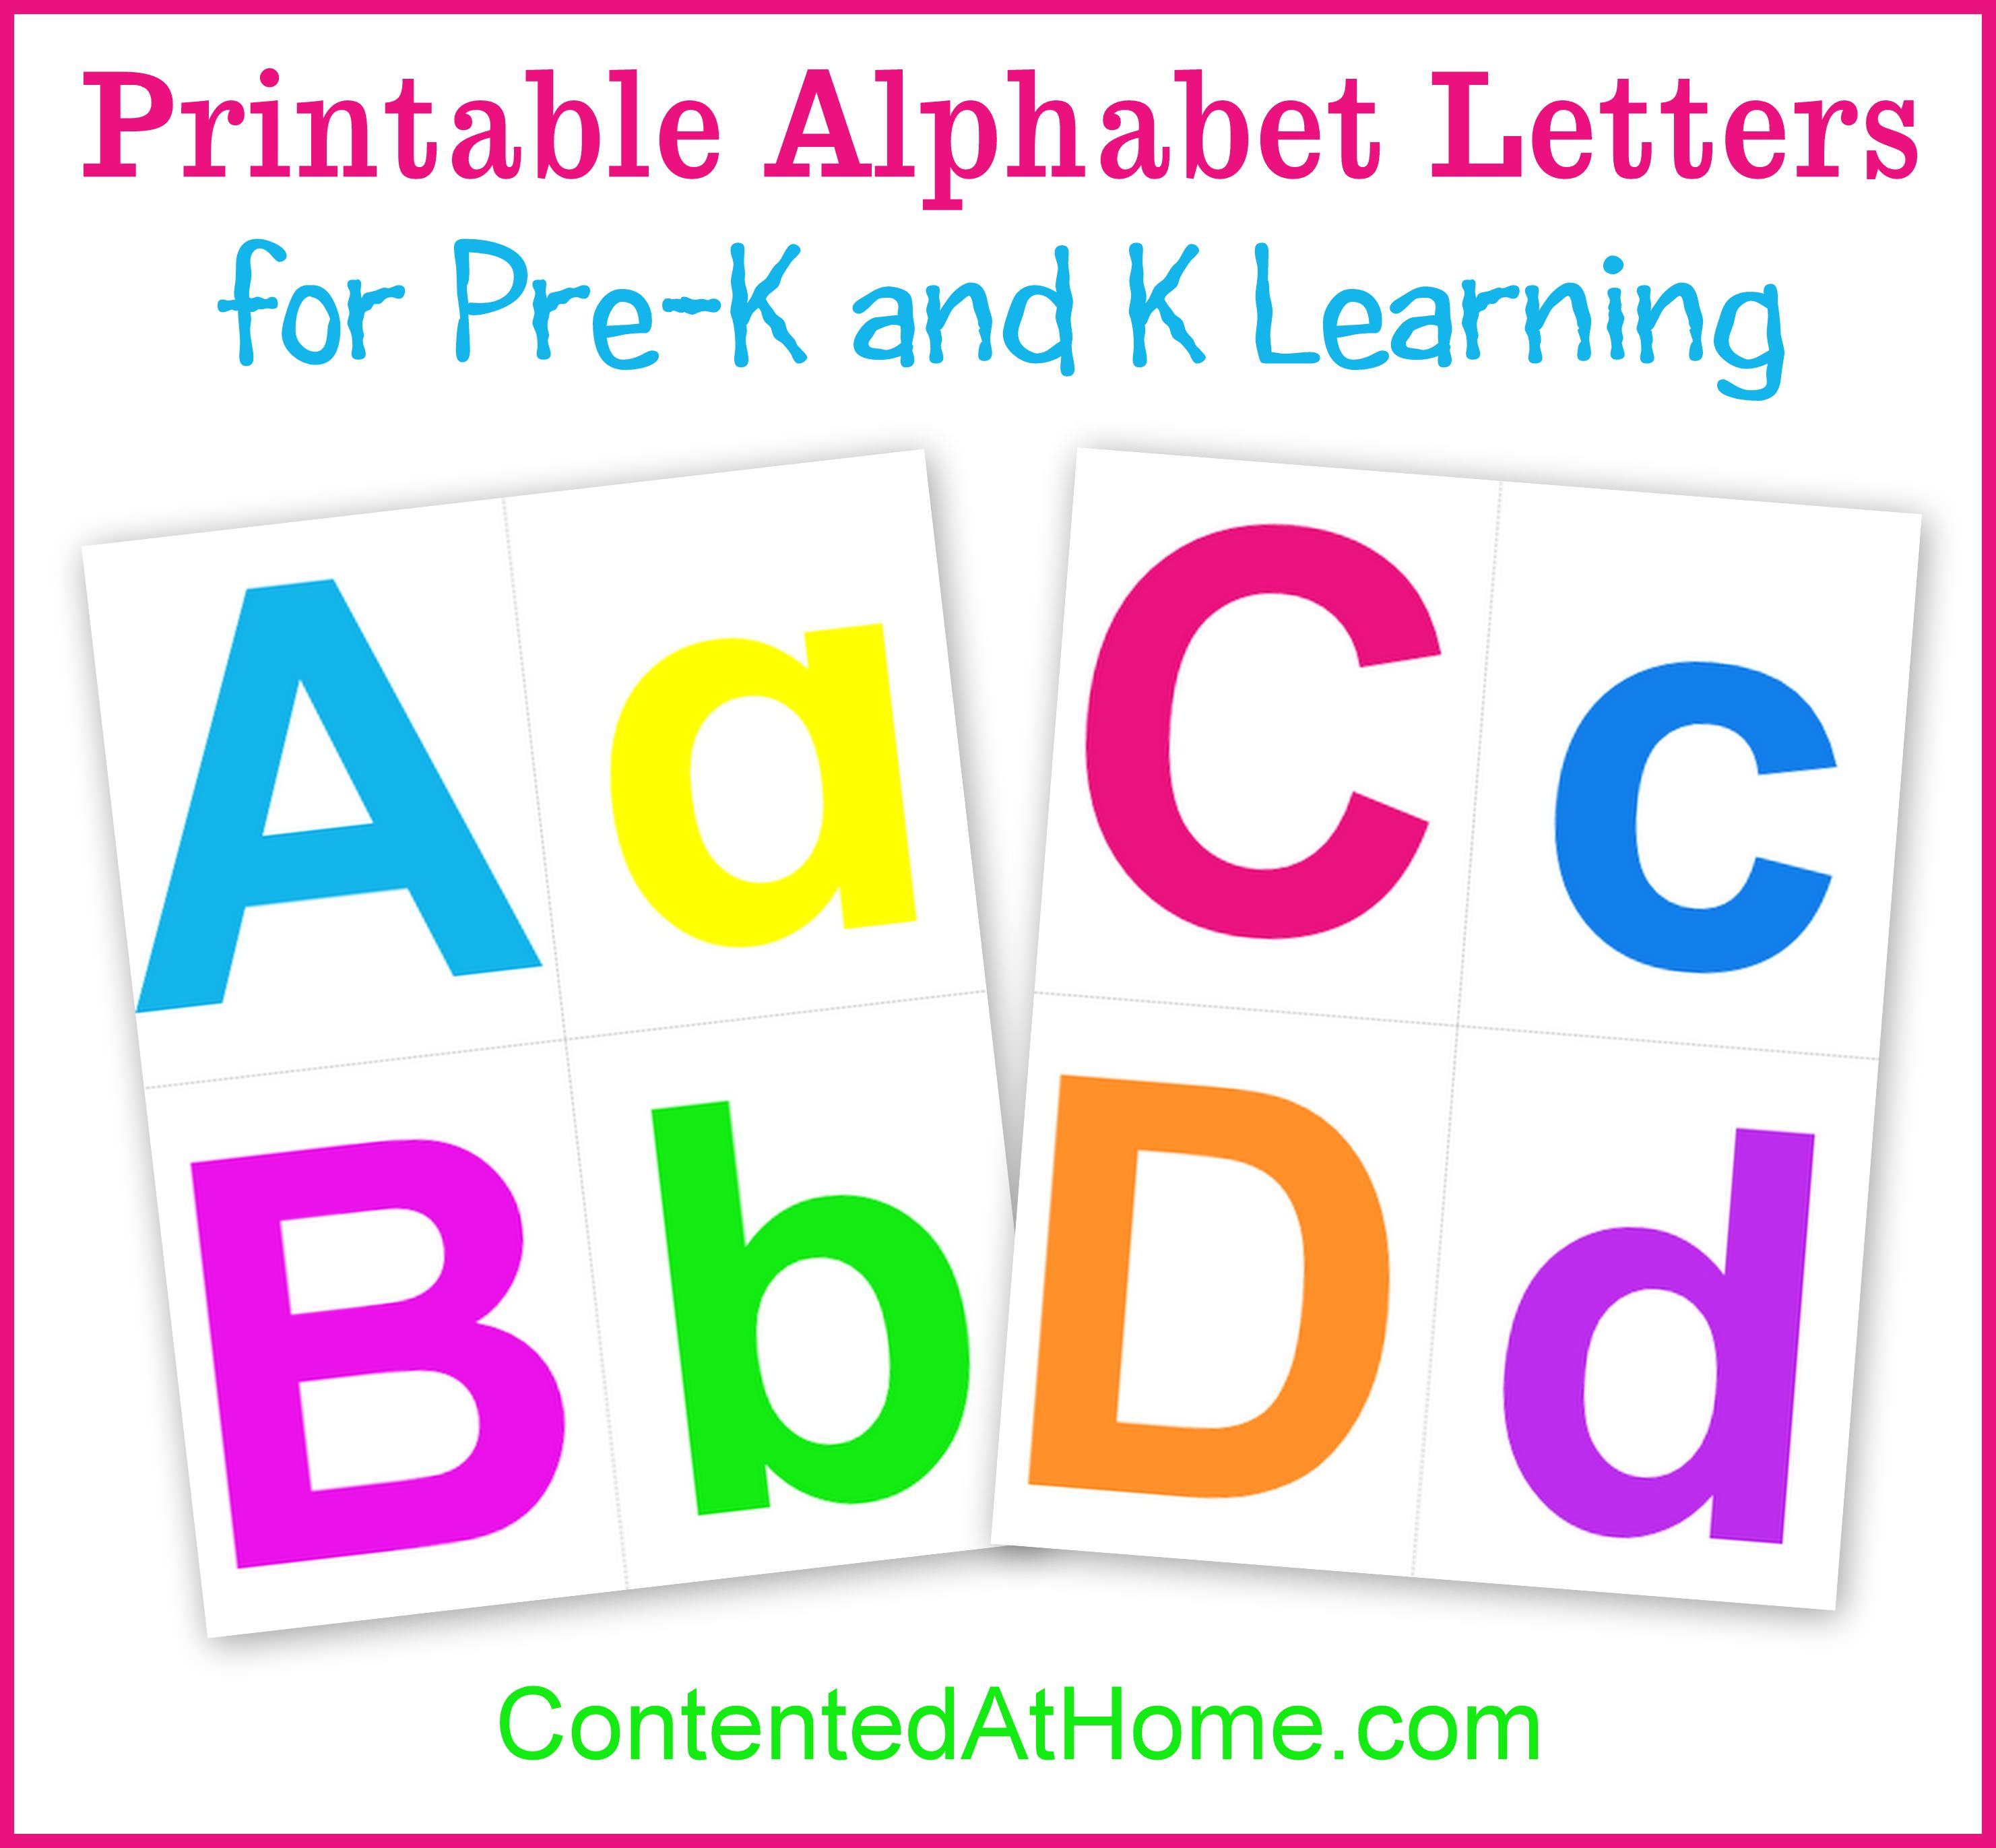 Printable Alphabet Letters